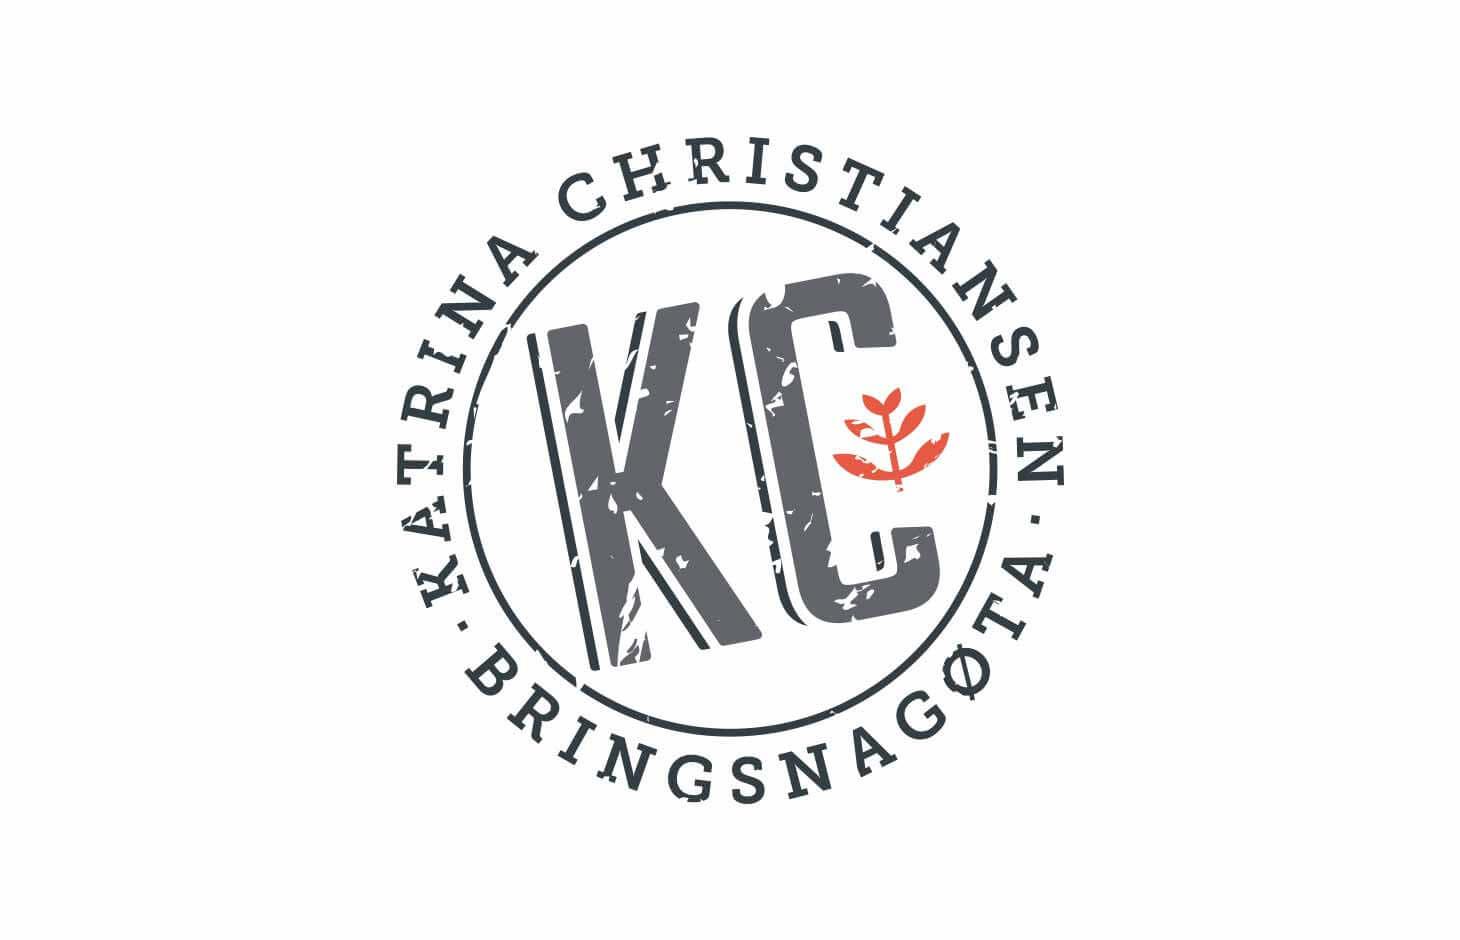 Katrina Christiansen